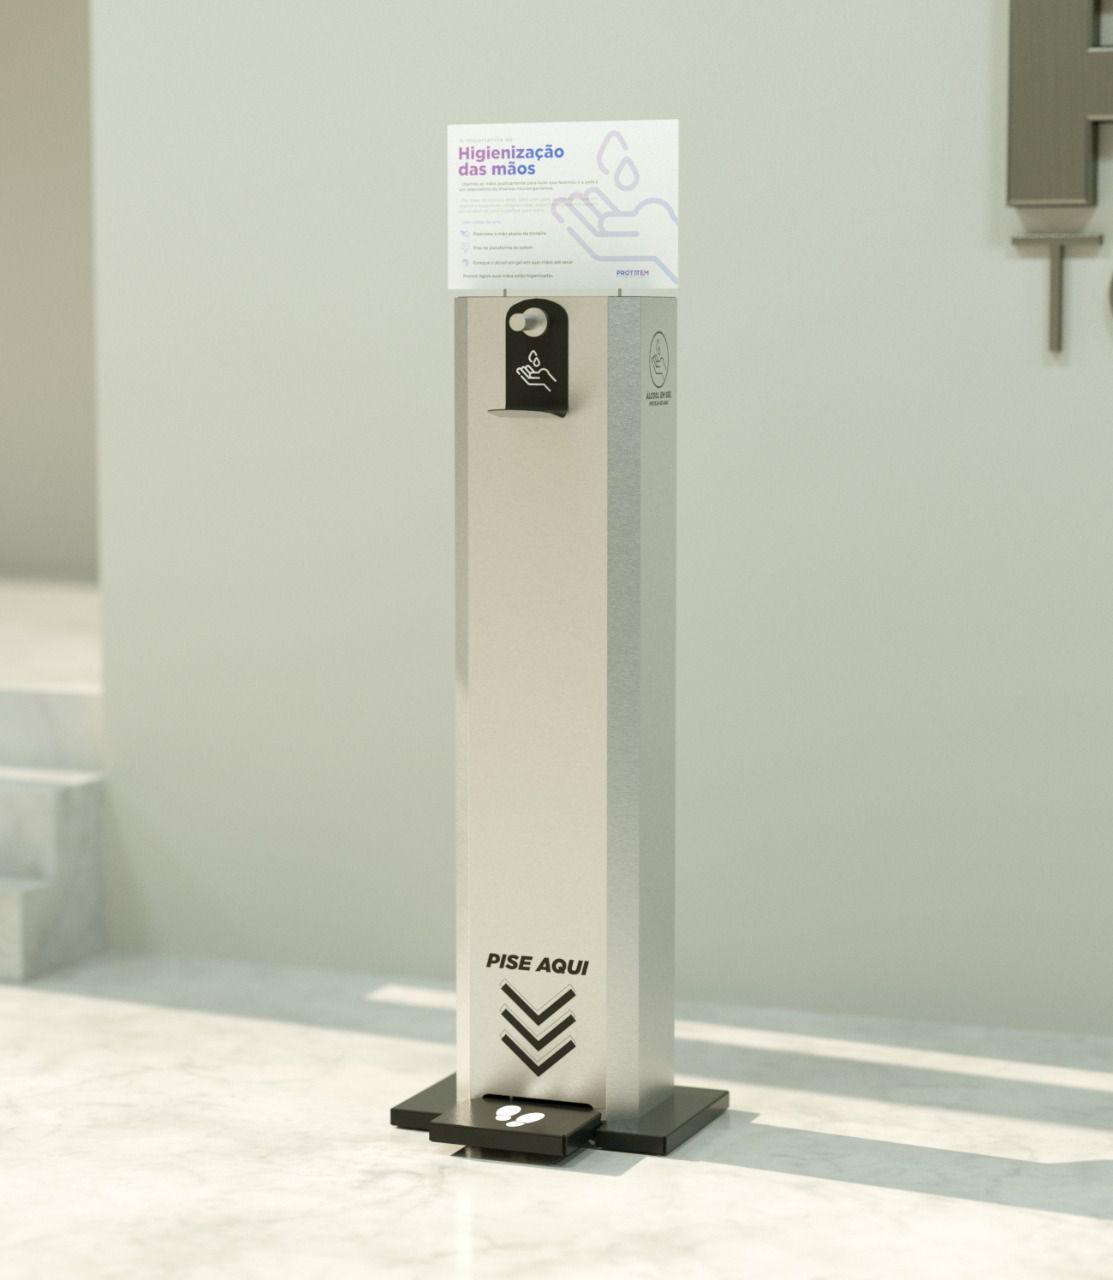 Totem Alcool Gel Profissional INOX- reservatório 6 Litros - Placa Branca  -  Serralheria Digital